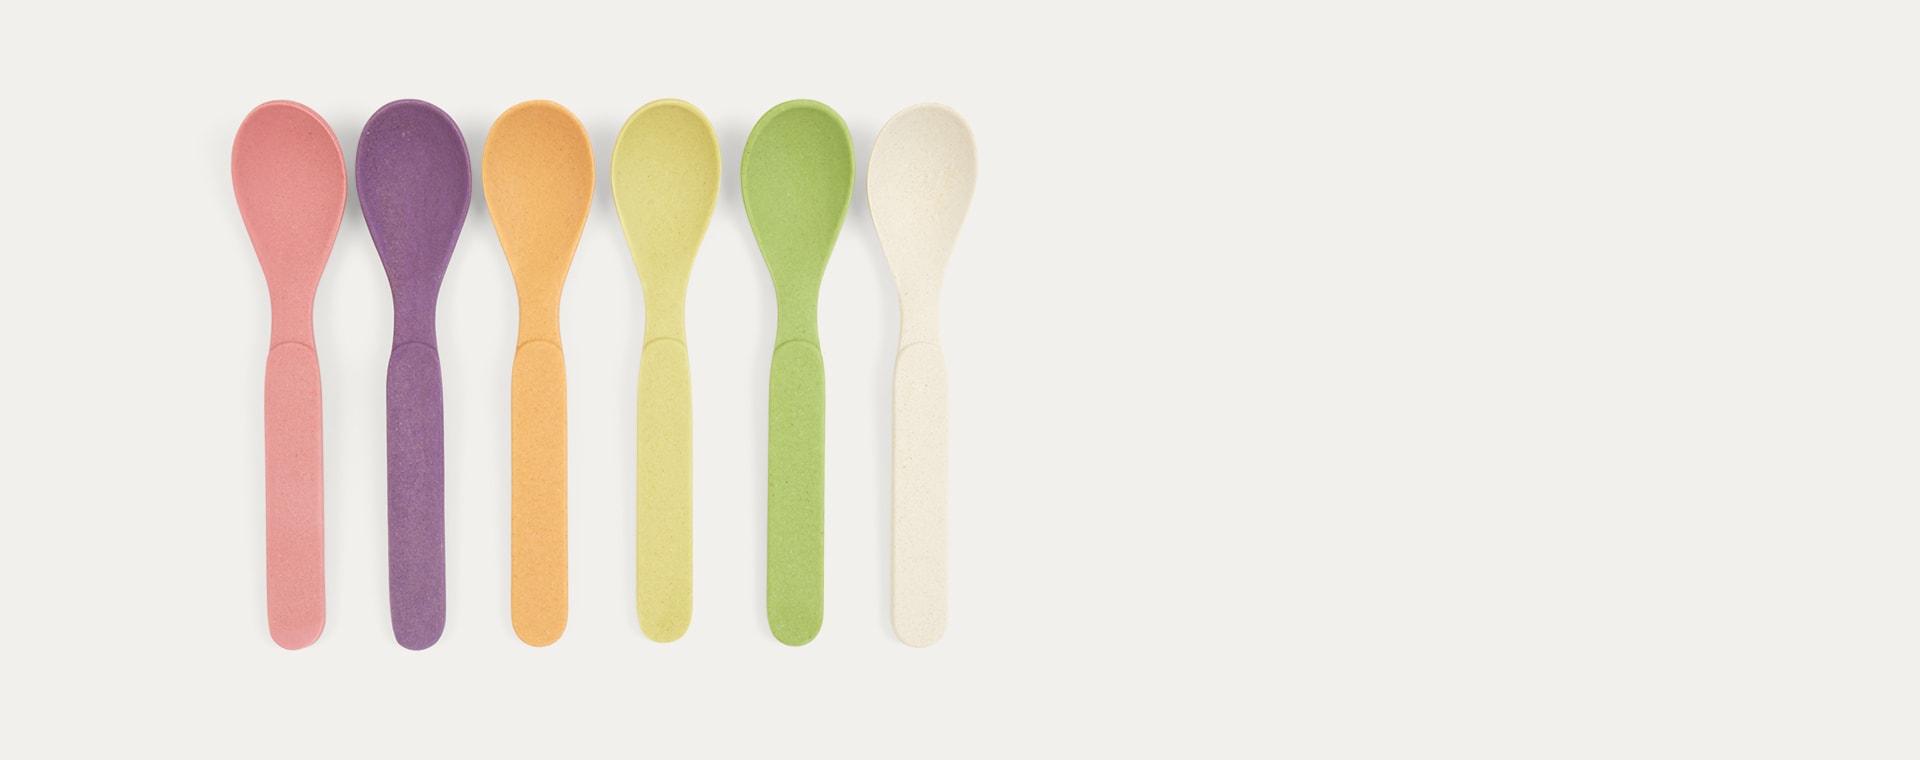 Rainbow Zuperzozial Spoons Set Of 6